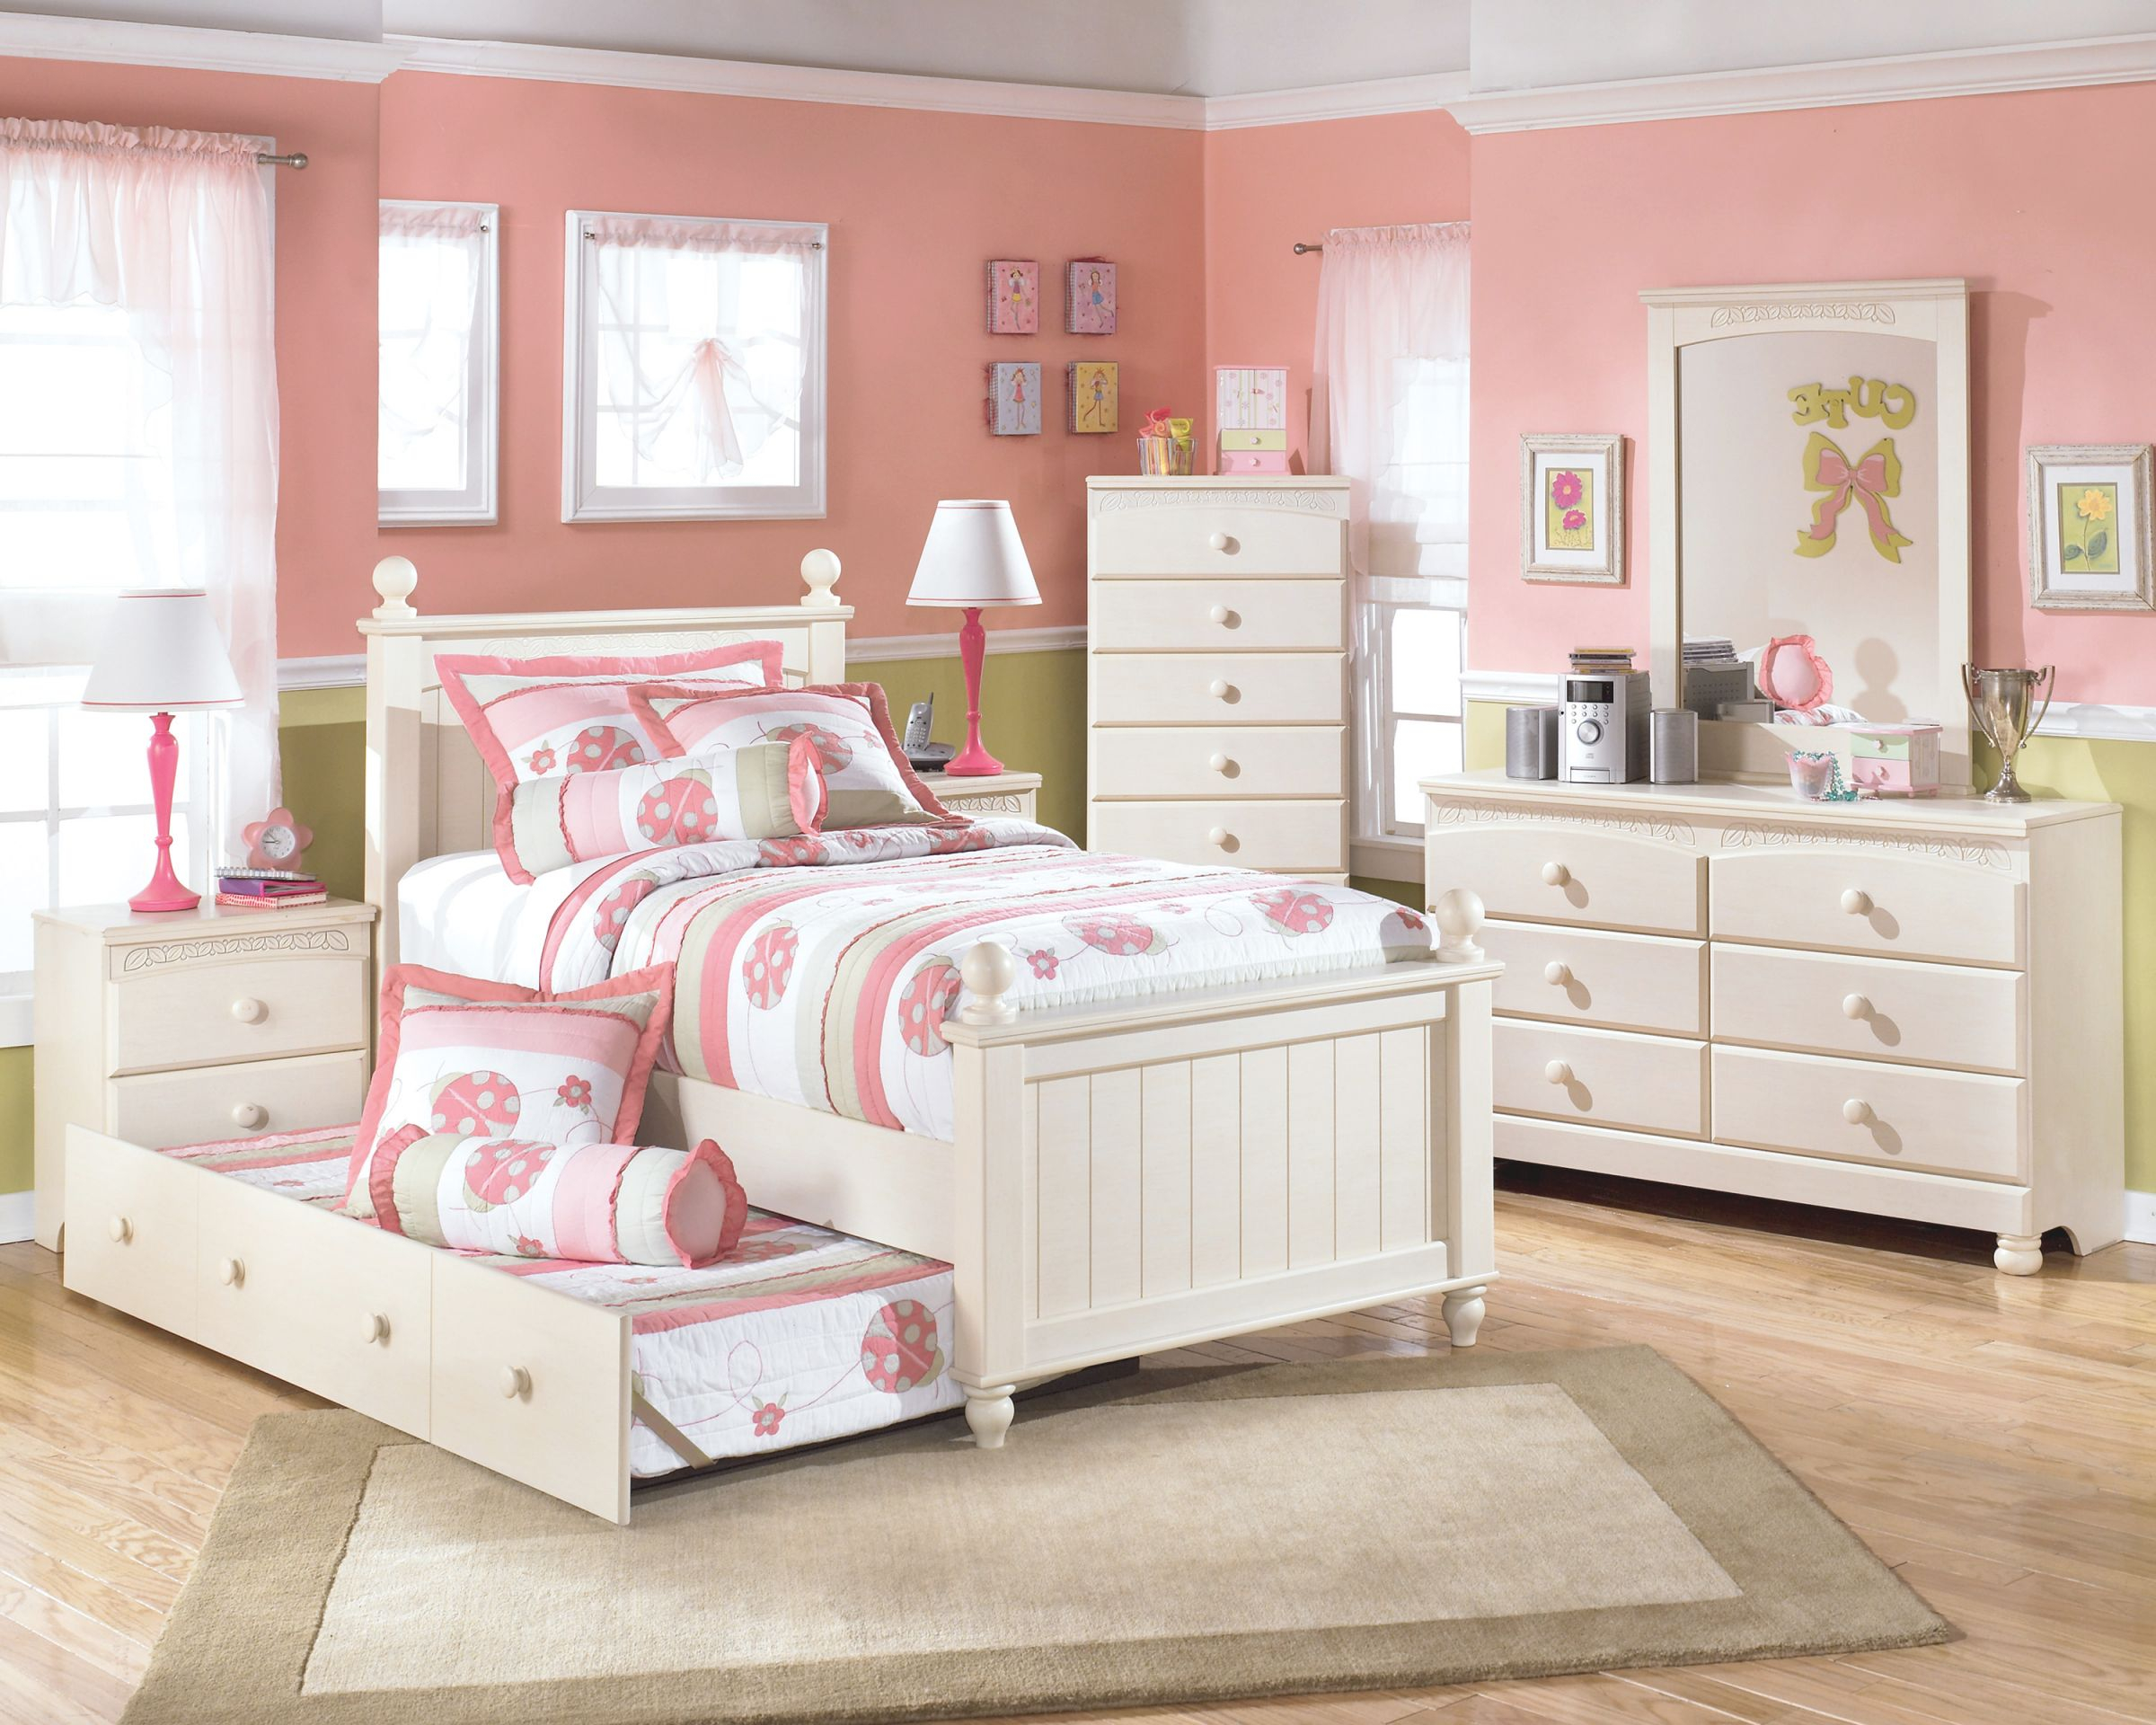 Marvellous Beautiful Girls Bedroom Furniture Sets Marvelous within Bedroom Set Girl